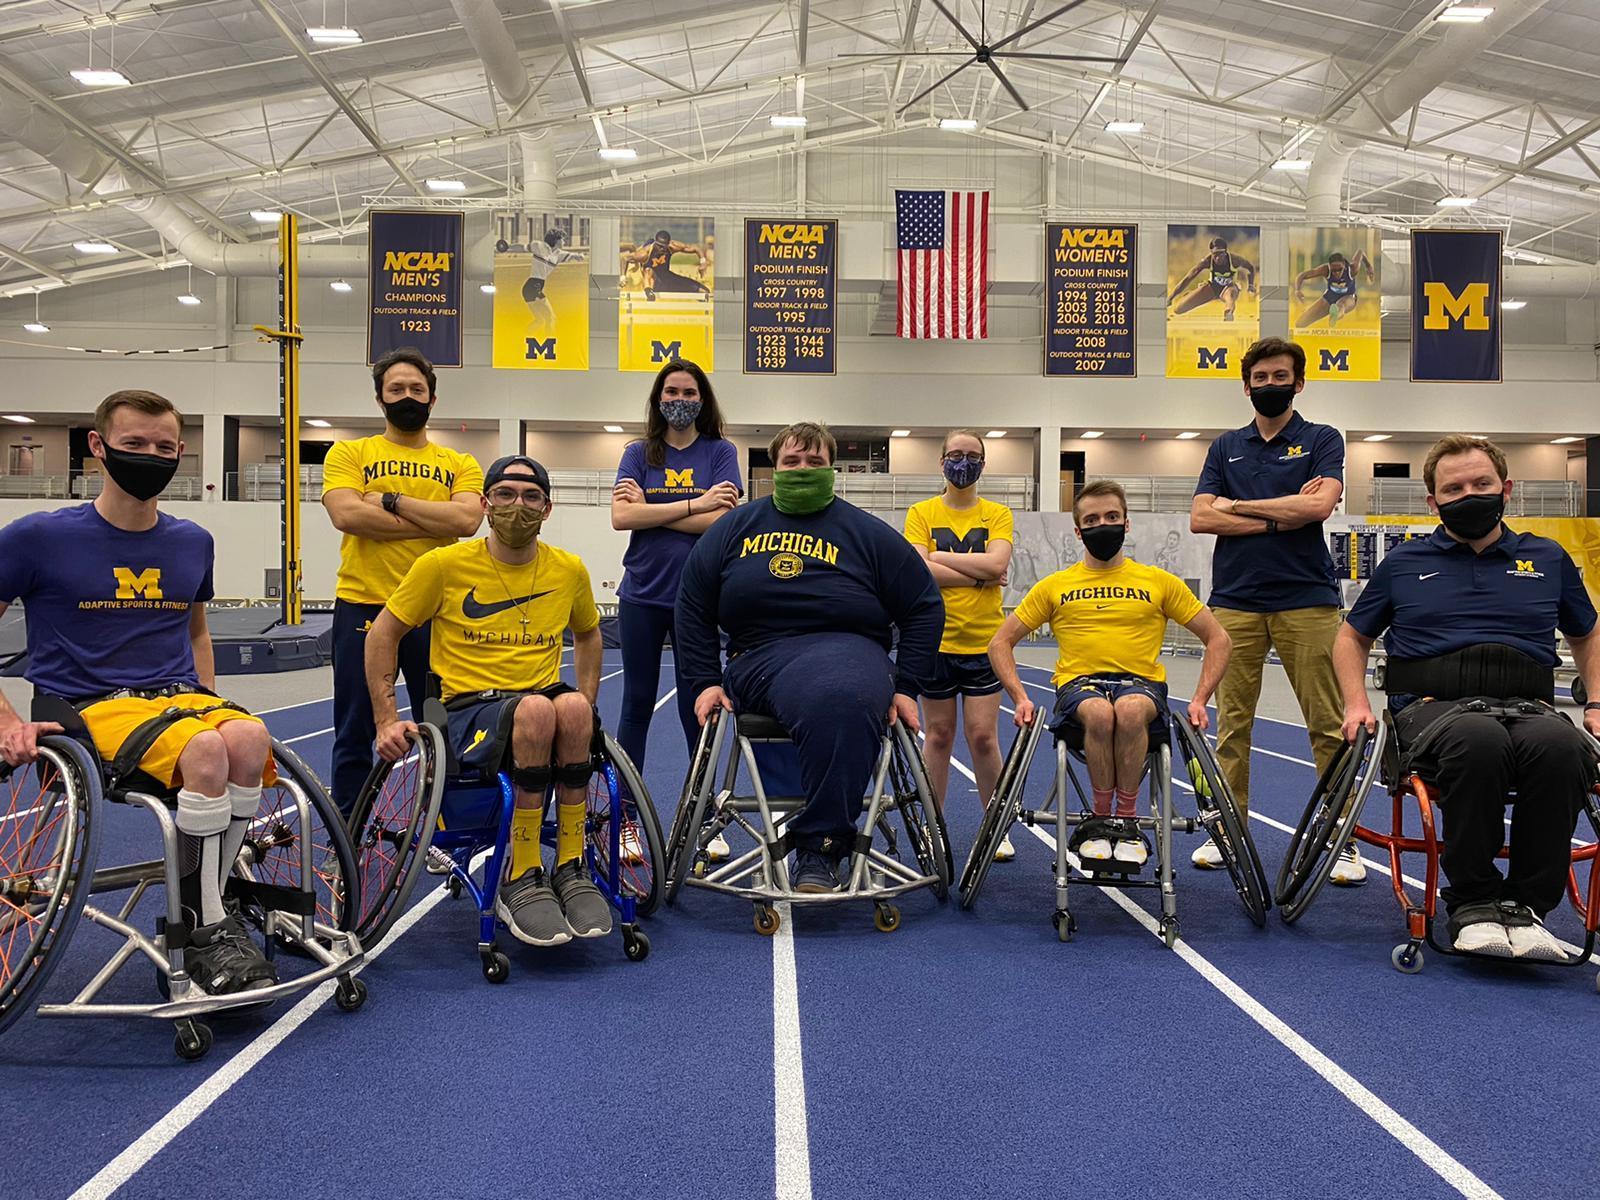 University of Michigan  Adaptive Sports and Fitness Team